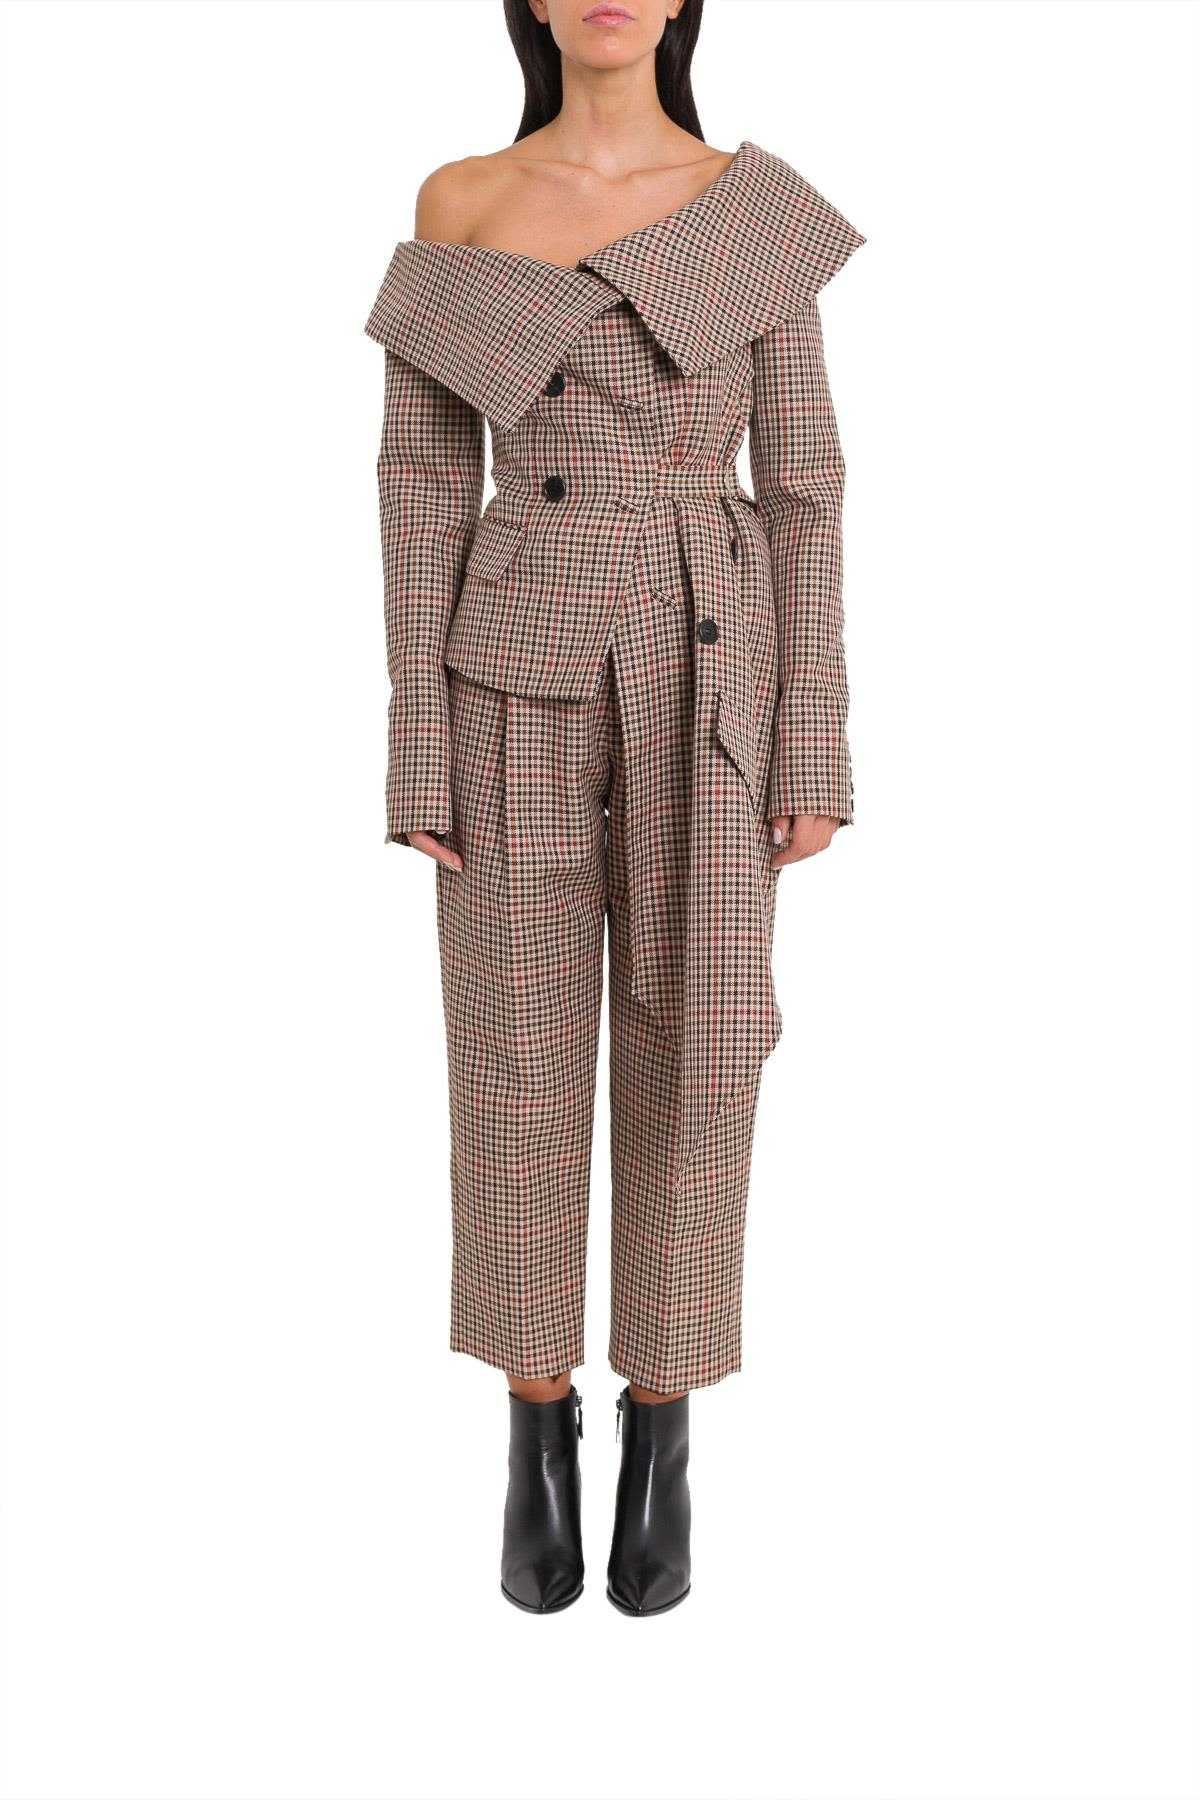 MONSE Asymmetrical Checkered Jacket